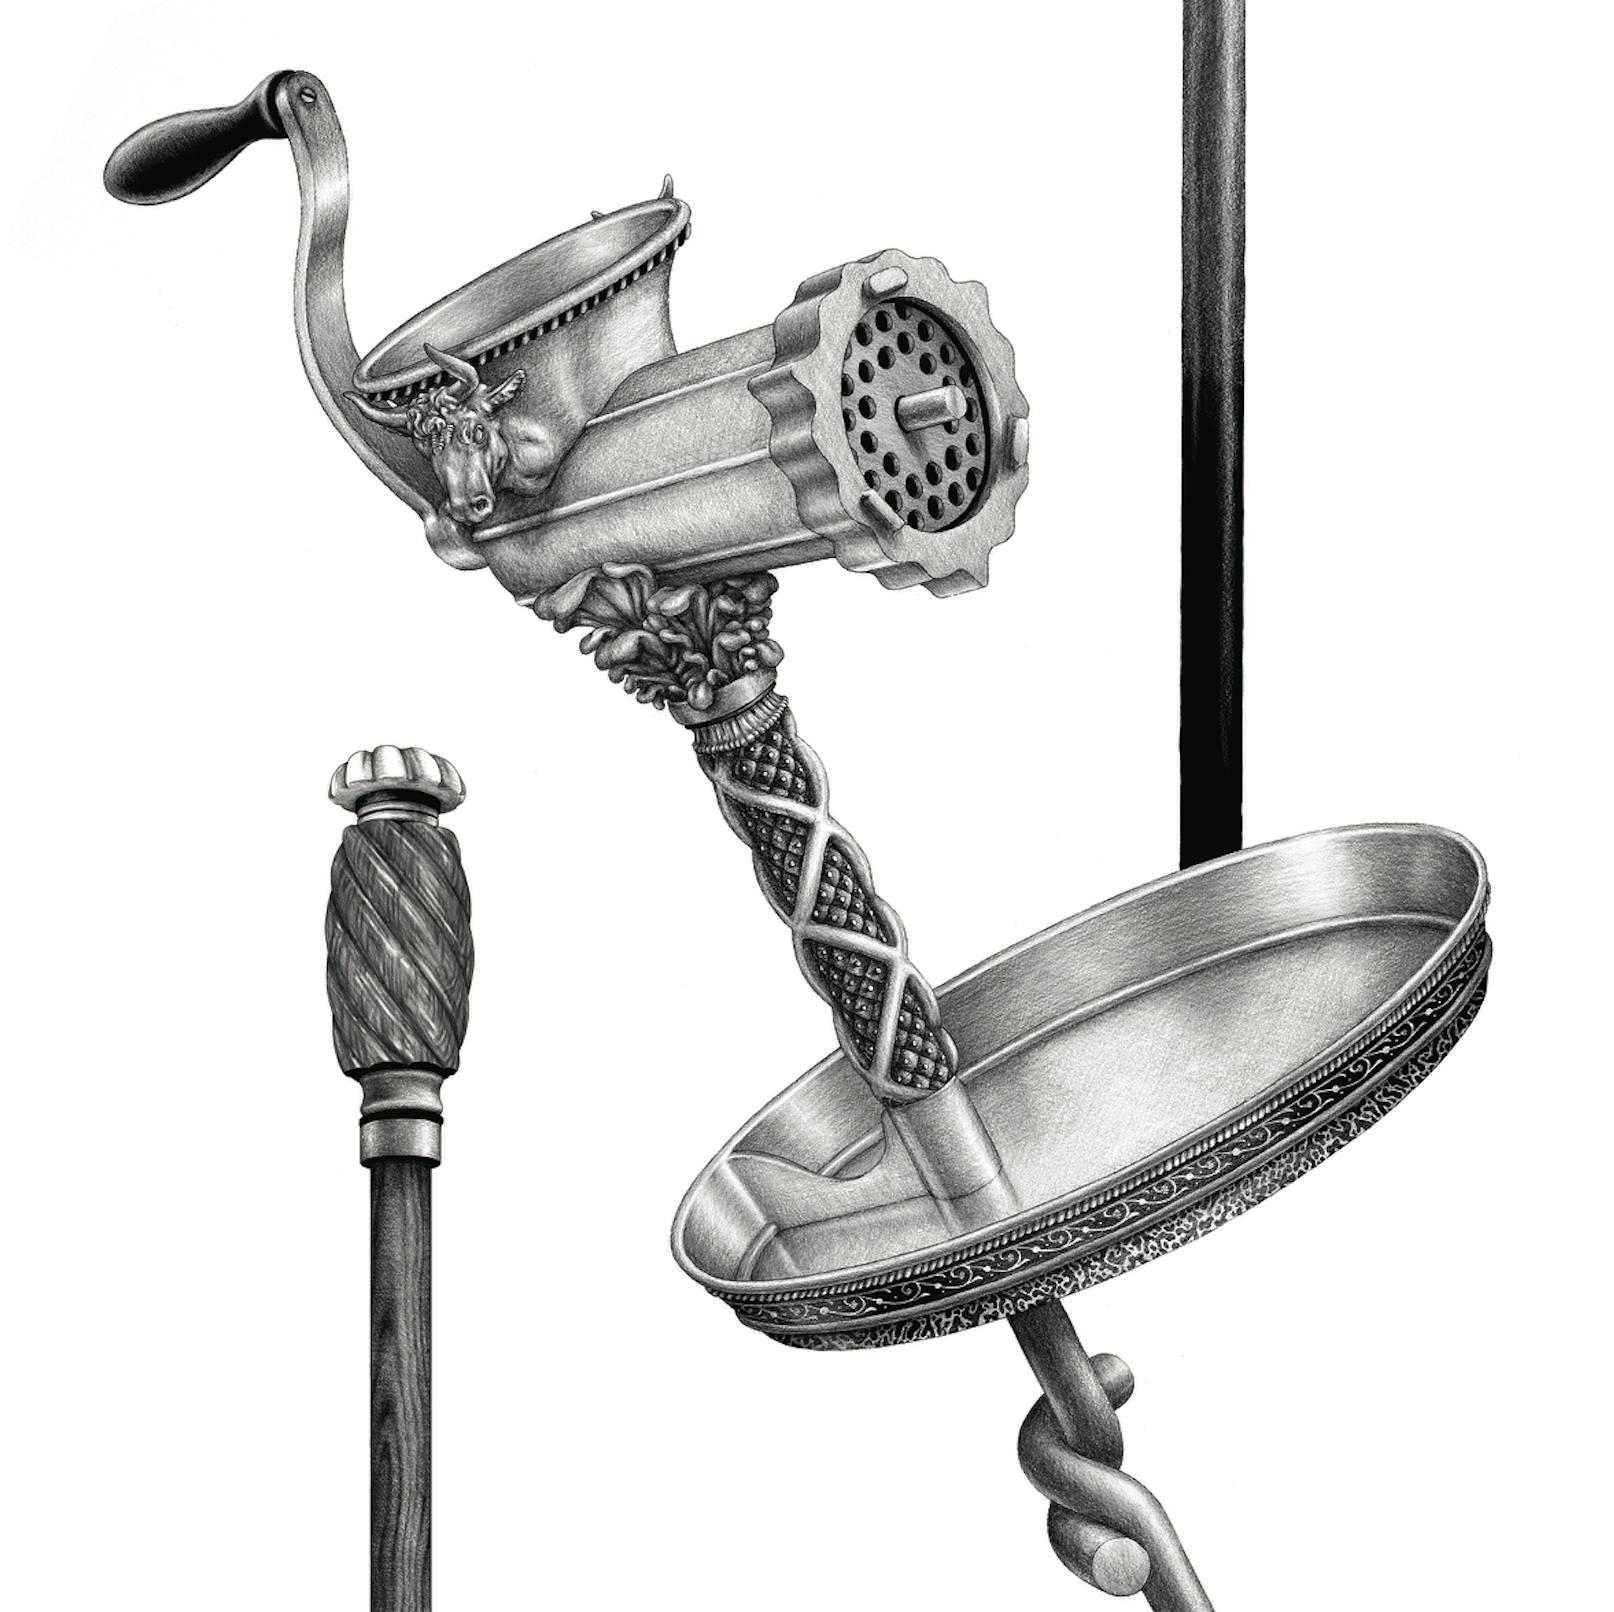 Ugo Gattoni Hermes walking sticks illustration projet dessin draw-4